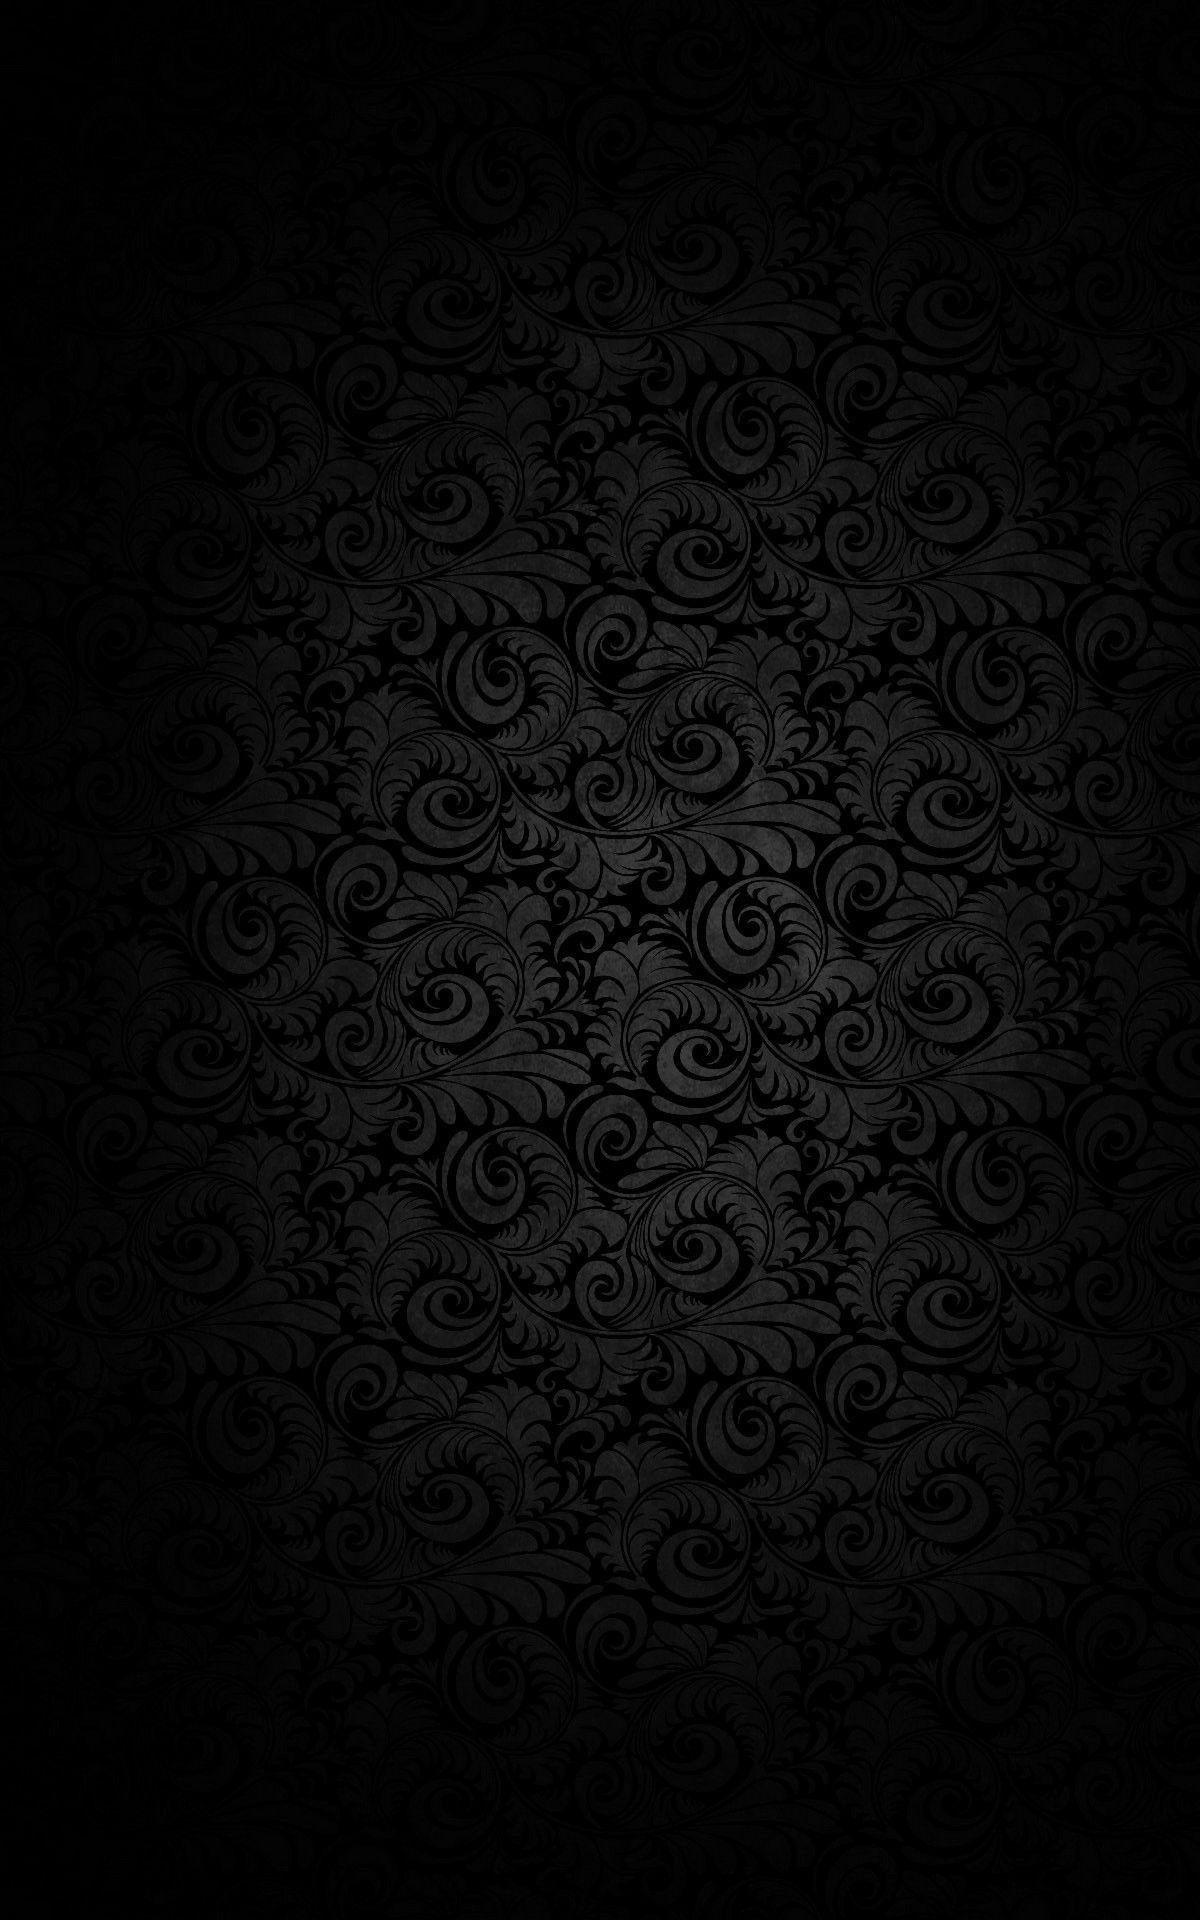 Opera Background Black Wallpaper Iphone Wallpaper Images Black Wallpaper Iphone